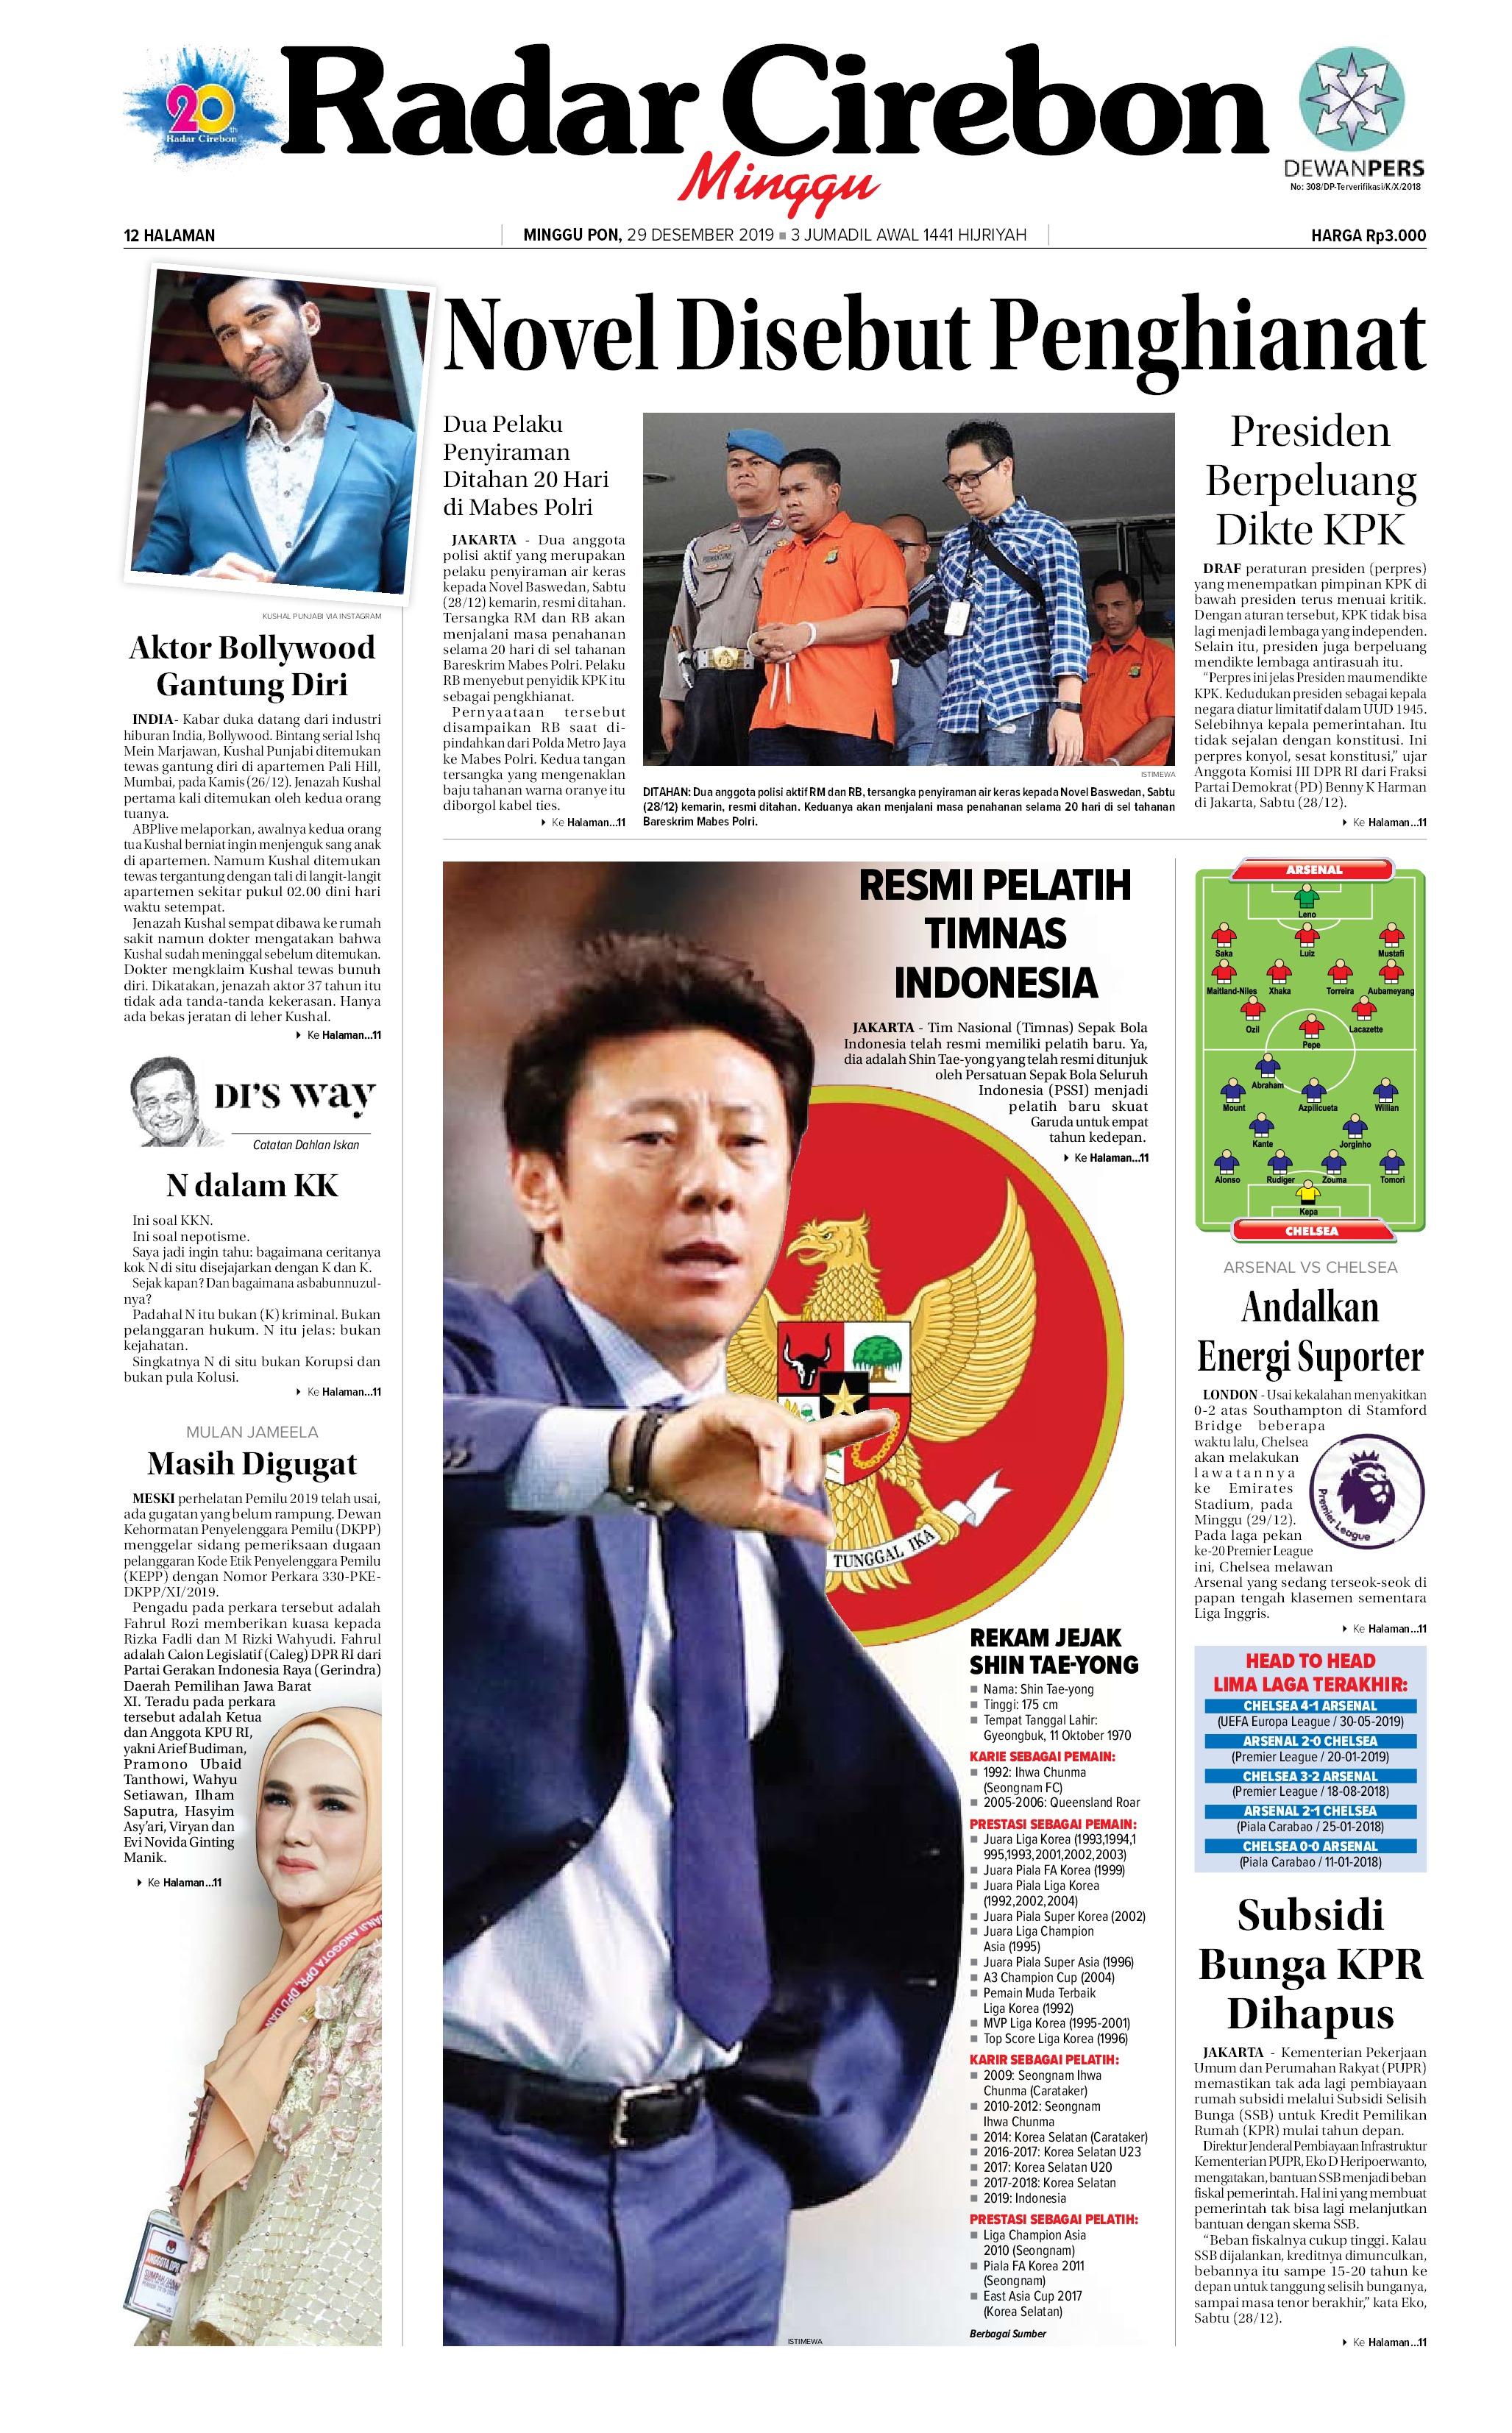 Radar Cirebon Newspaper 29 December 2019 Gramedia Digital